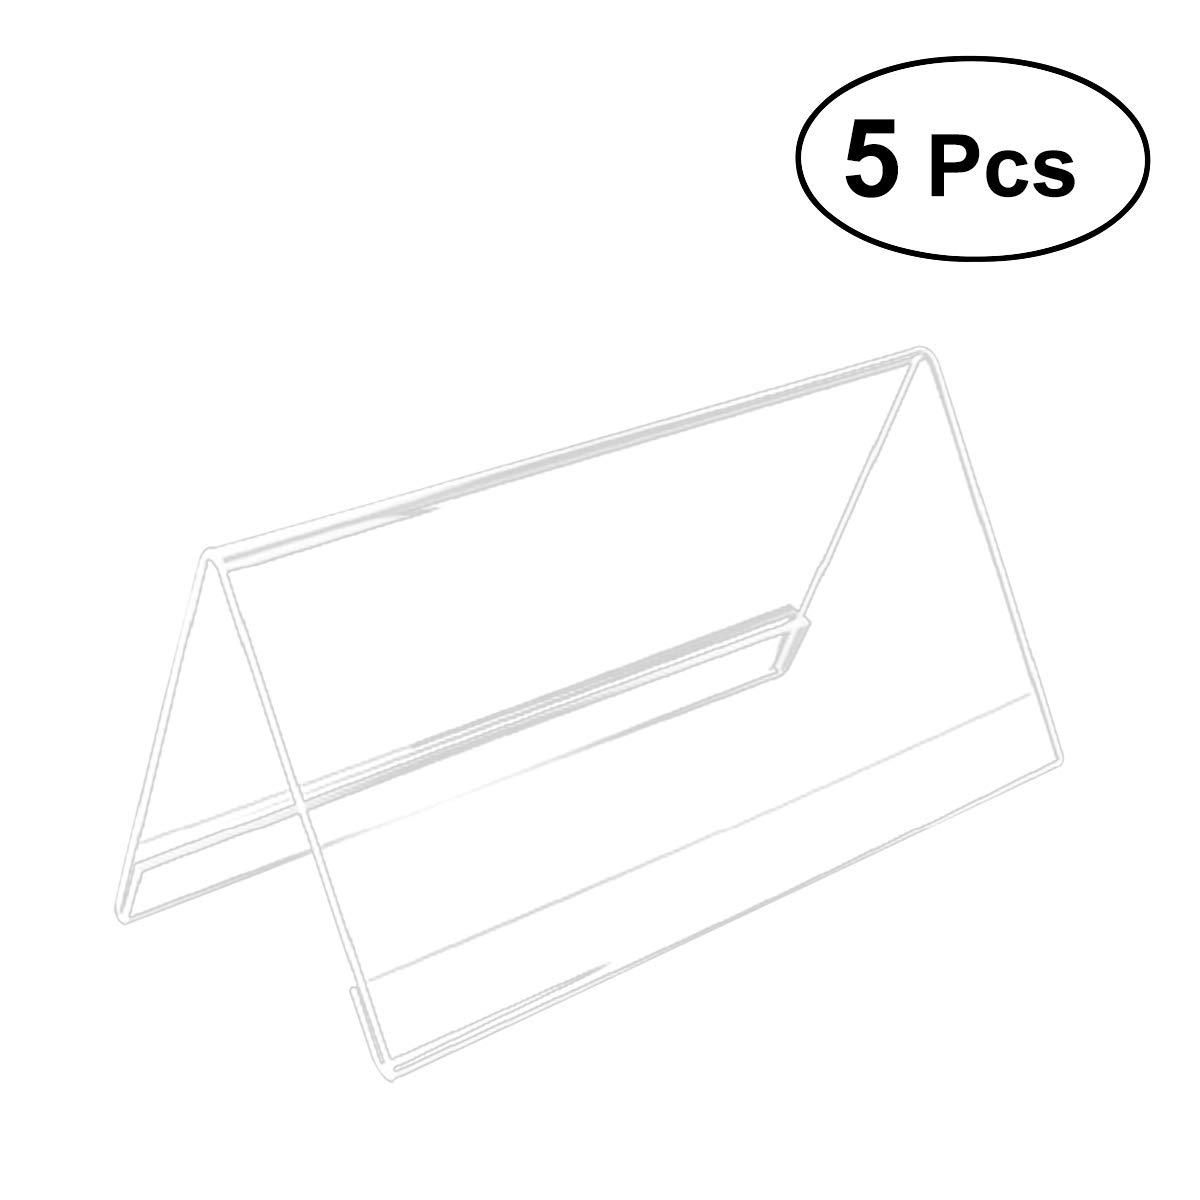 toymytoy 5個アクリルビジネスカードホルダーV型透明テーブルメニュー表示サインホルダー三角形会議カードホルダー   B07G5HC35N